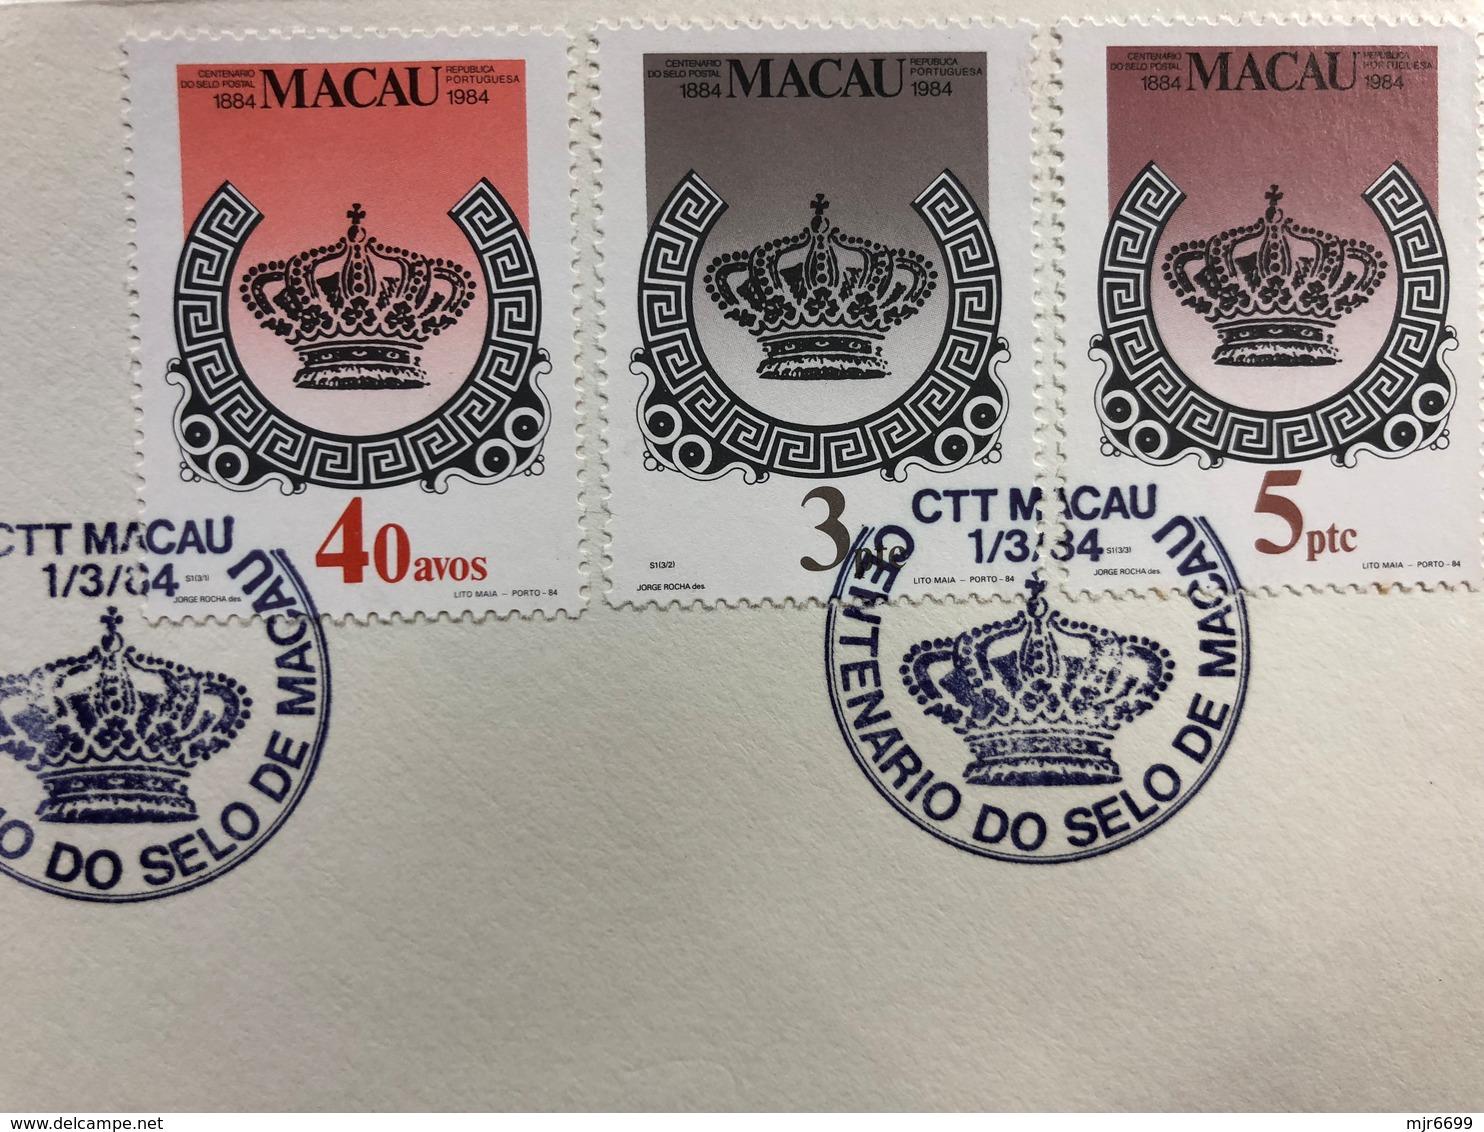 MACAU 1984 CENTENARY OF THE MACAU STAMP FDC - Macao